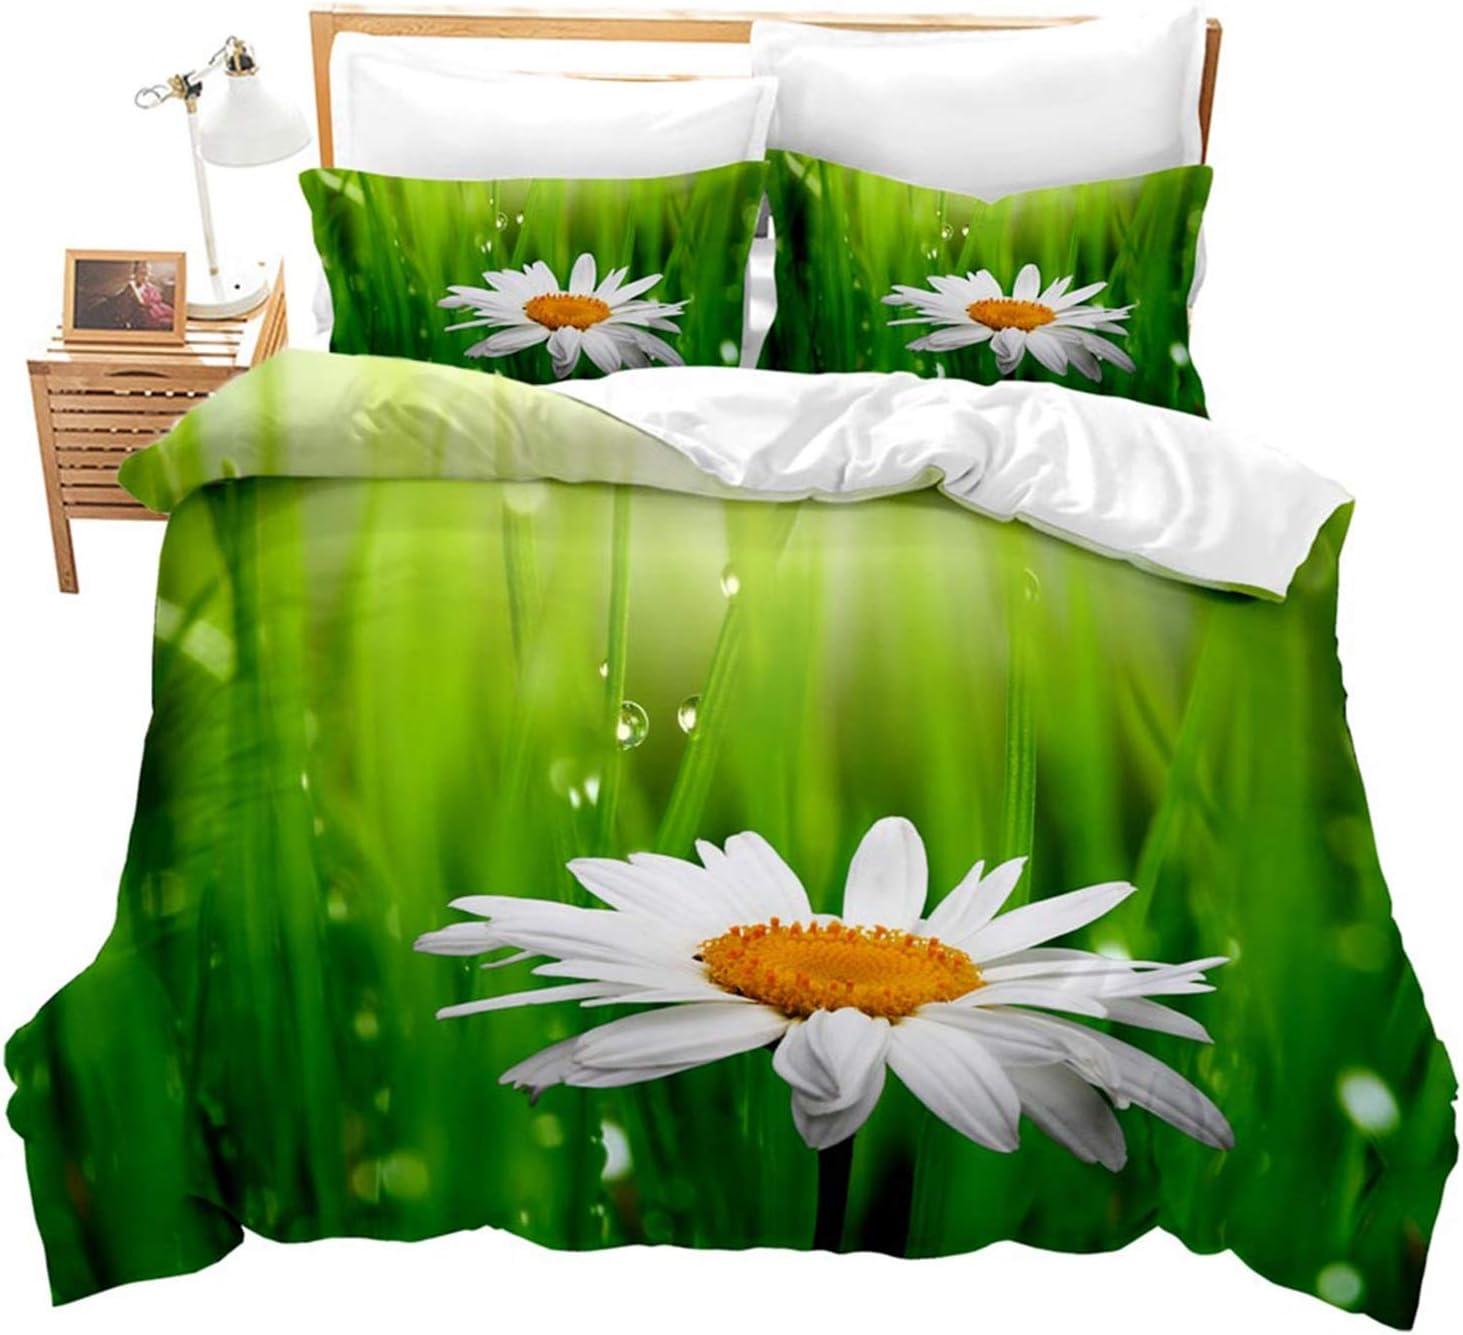 KORANGE Duvet Cover 3 Pieces Bedding Microfiber Pillowcas supreme Fashion 2 with